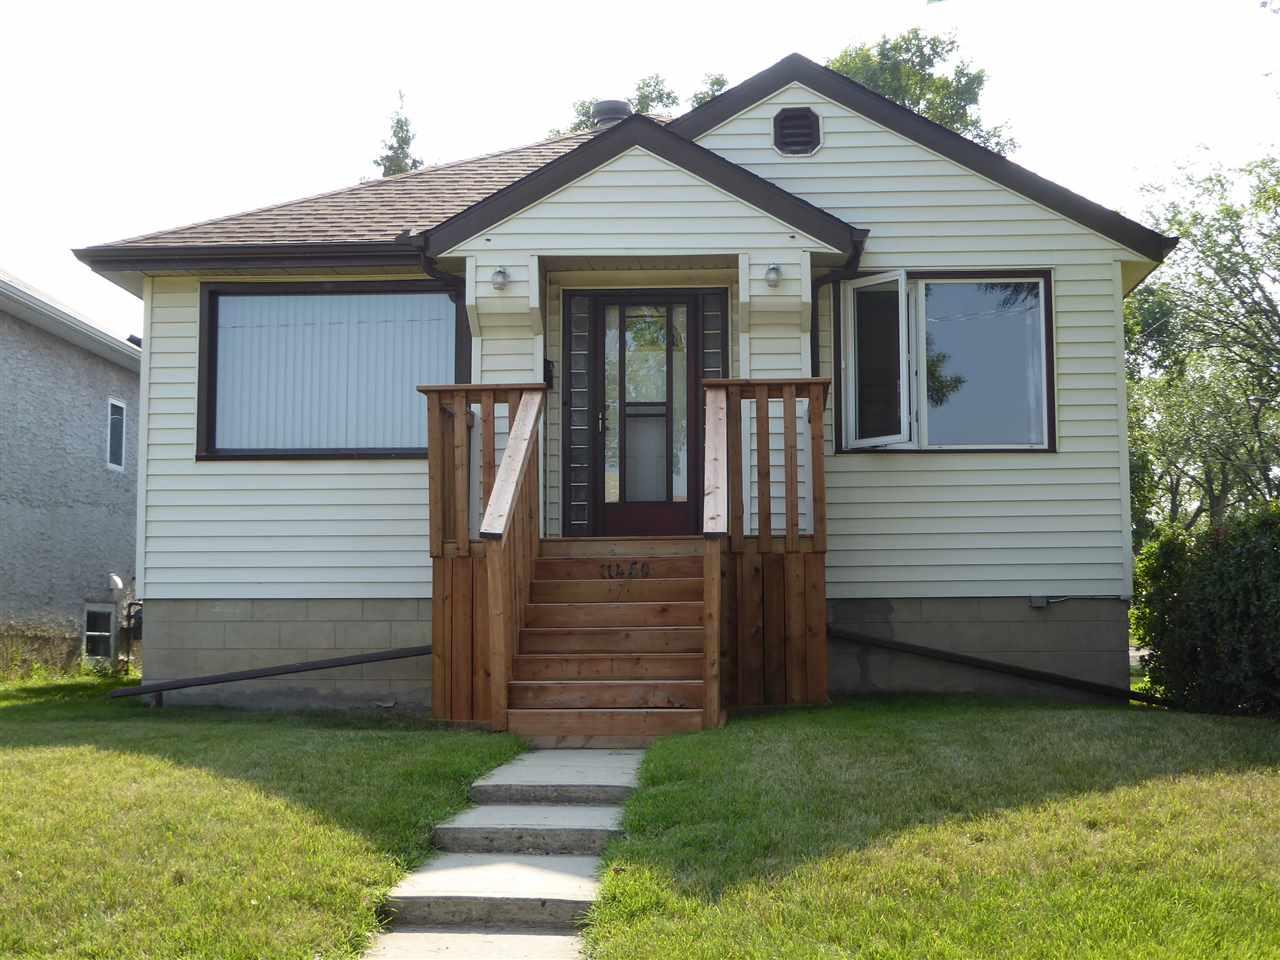 11450 70 Street NW, 3 bed, 1 bath, at $282,500